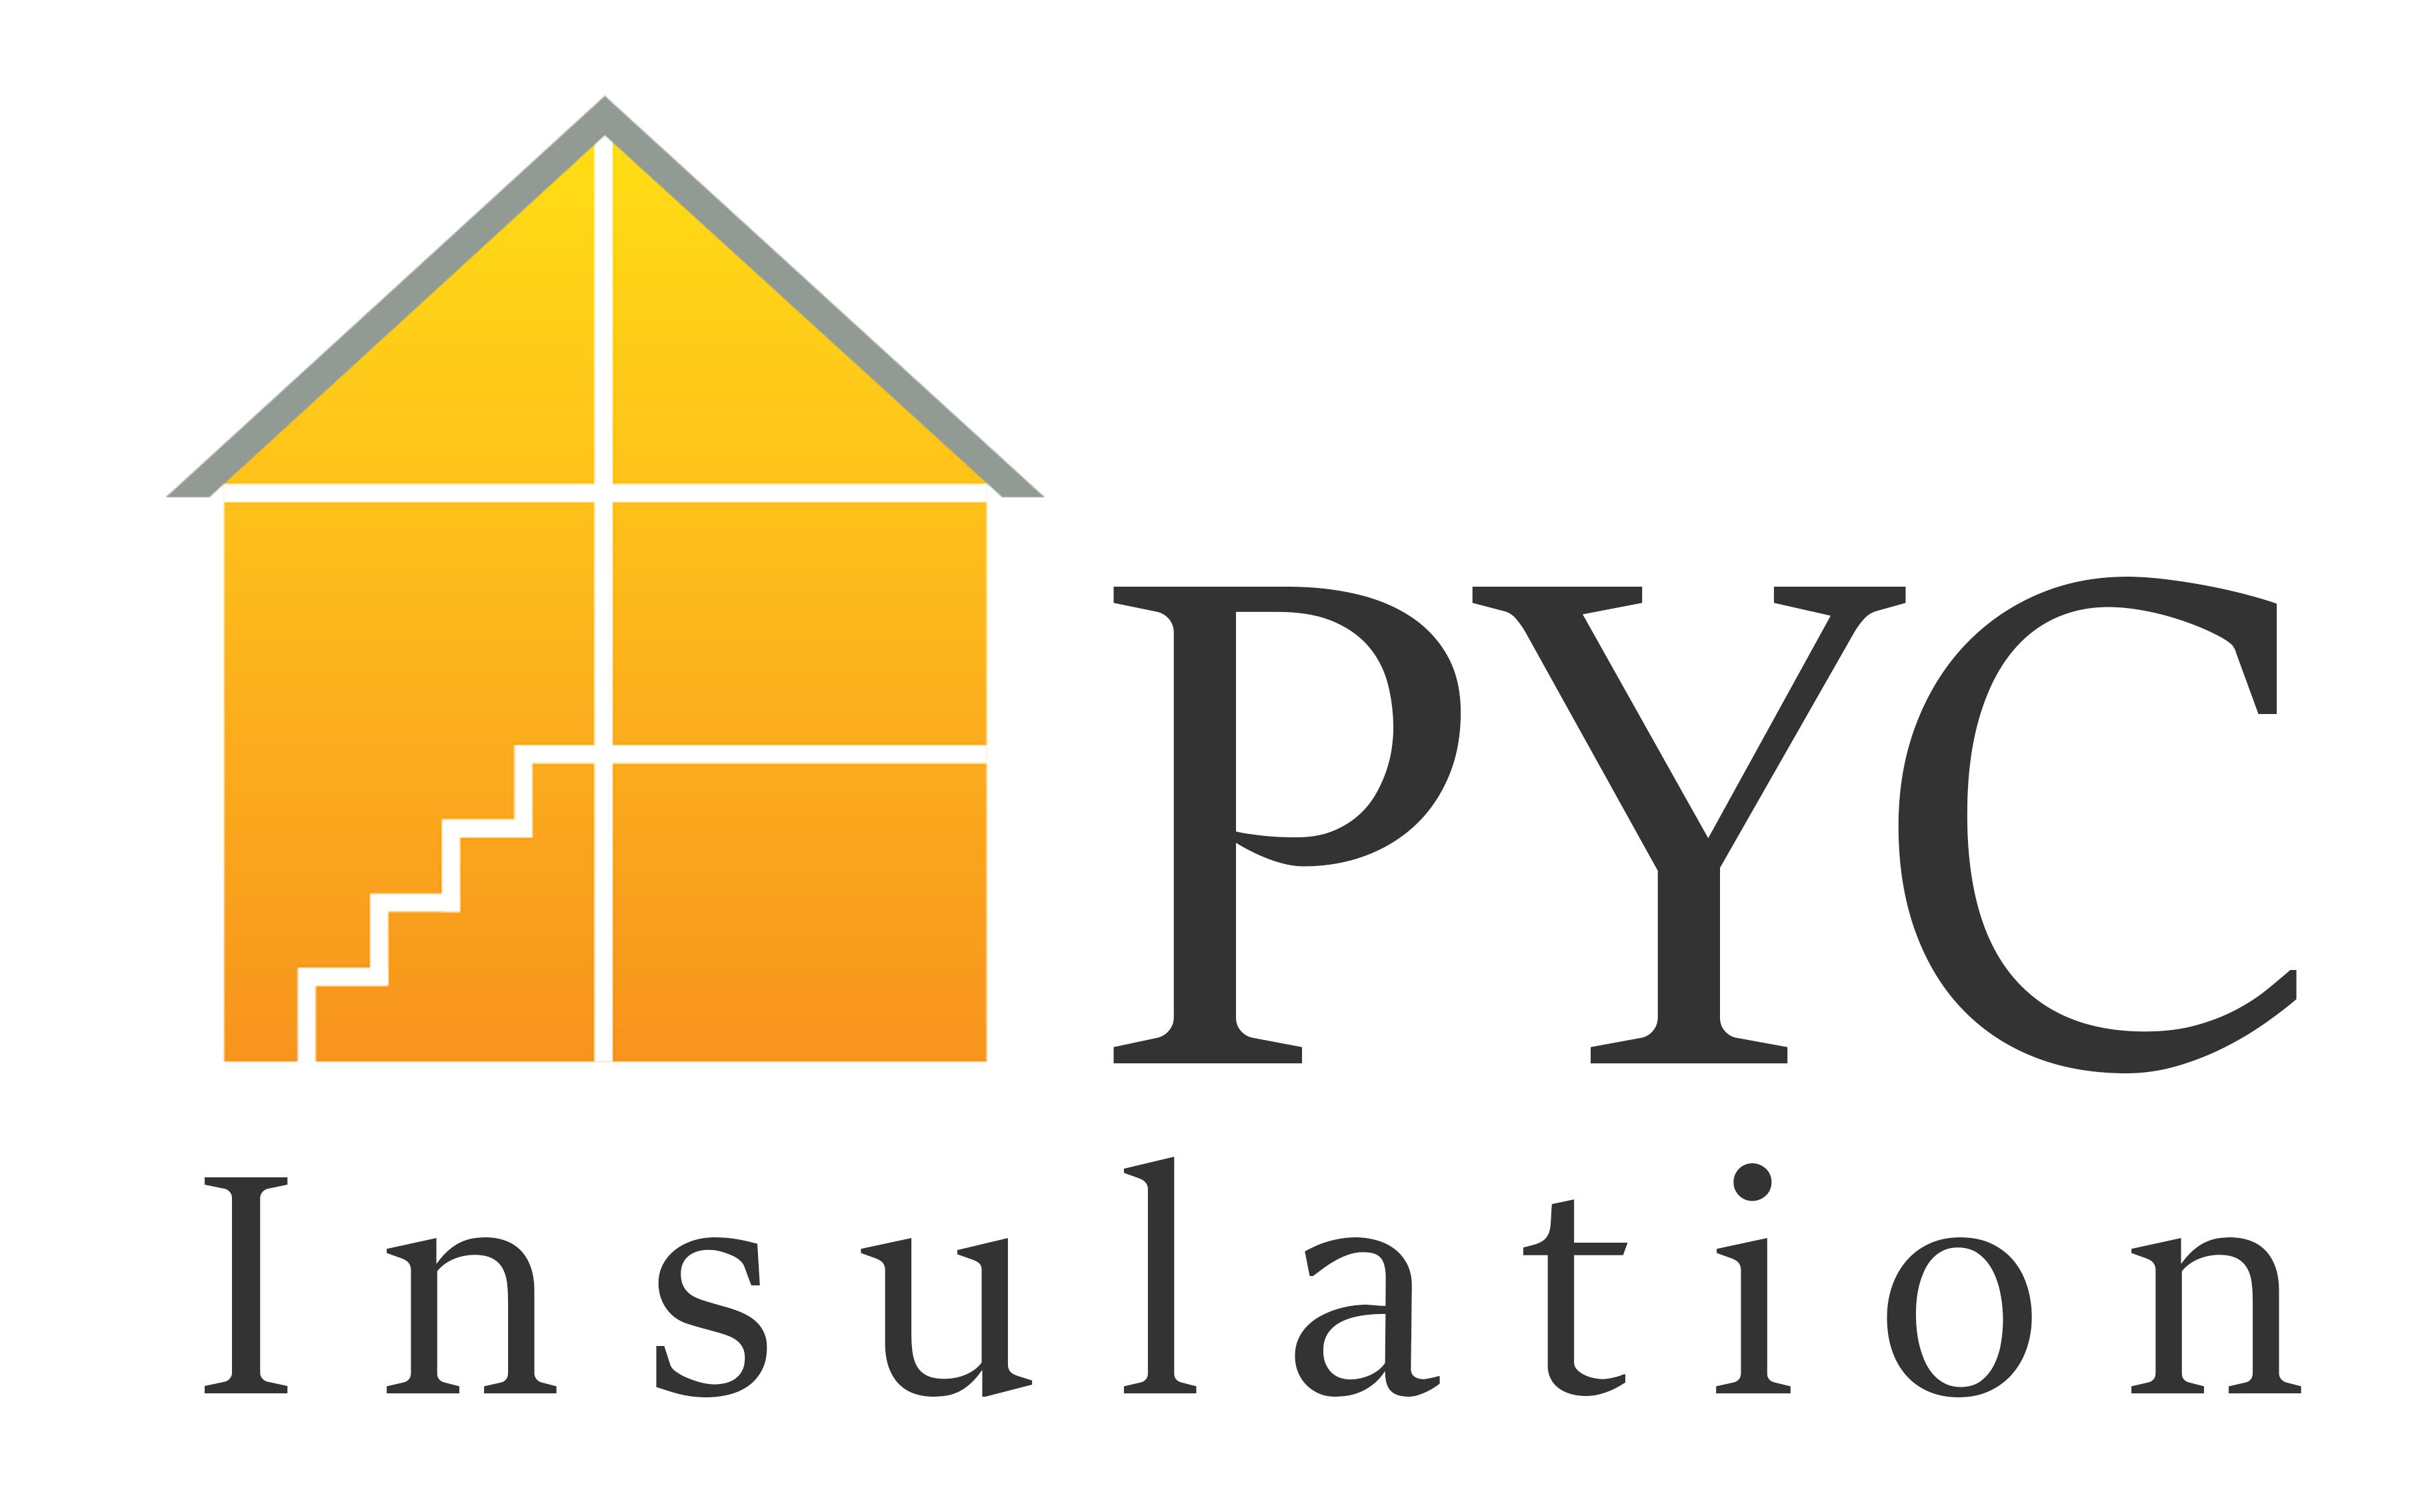 environmentally friendly insulation